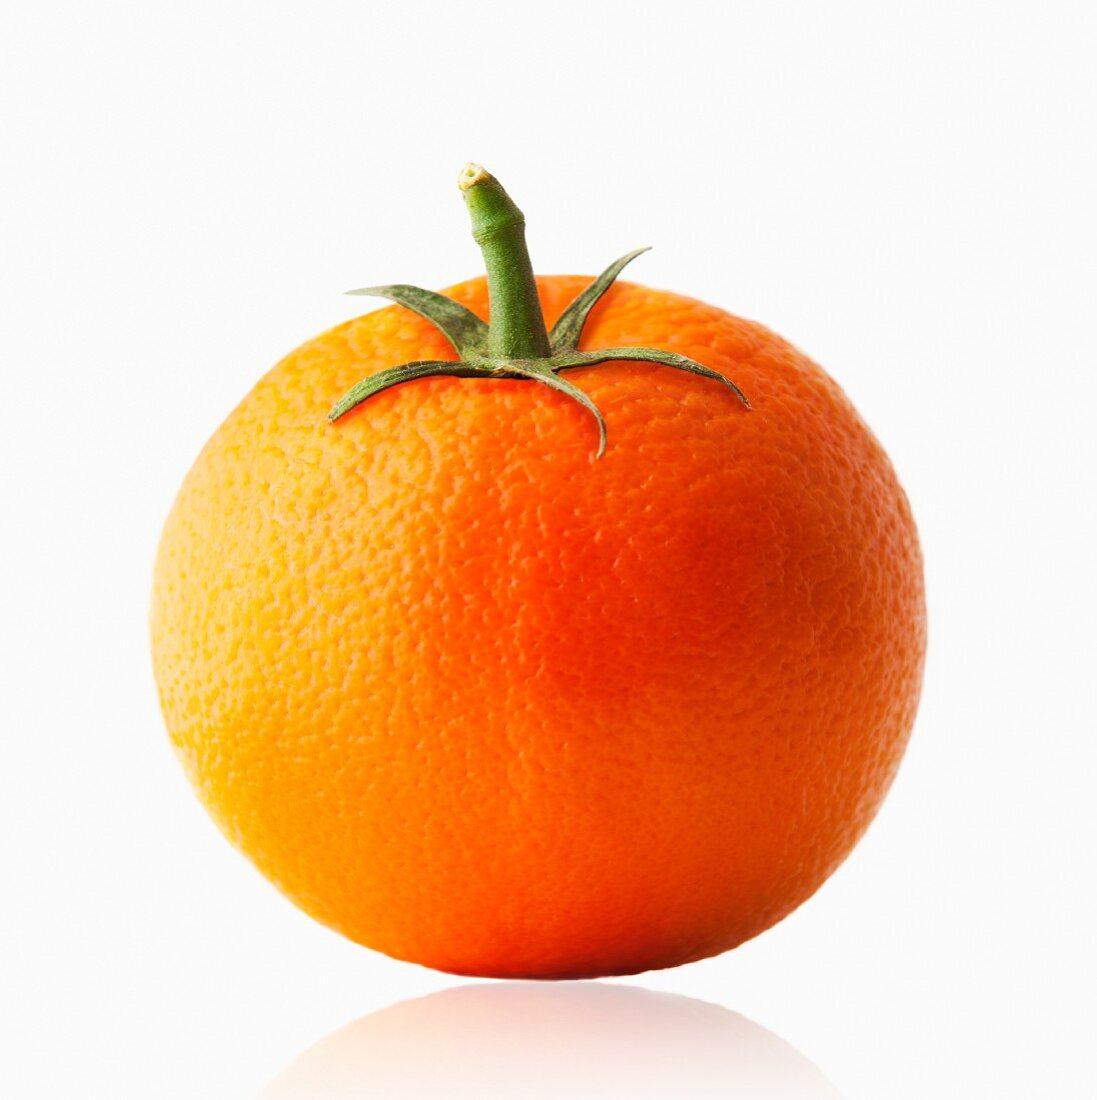 Orange with tomato stem